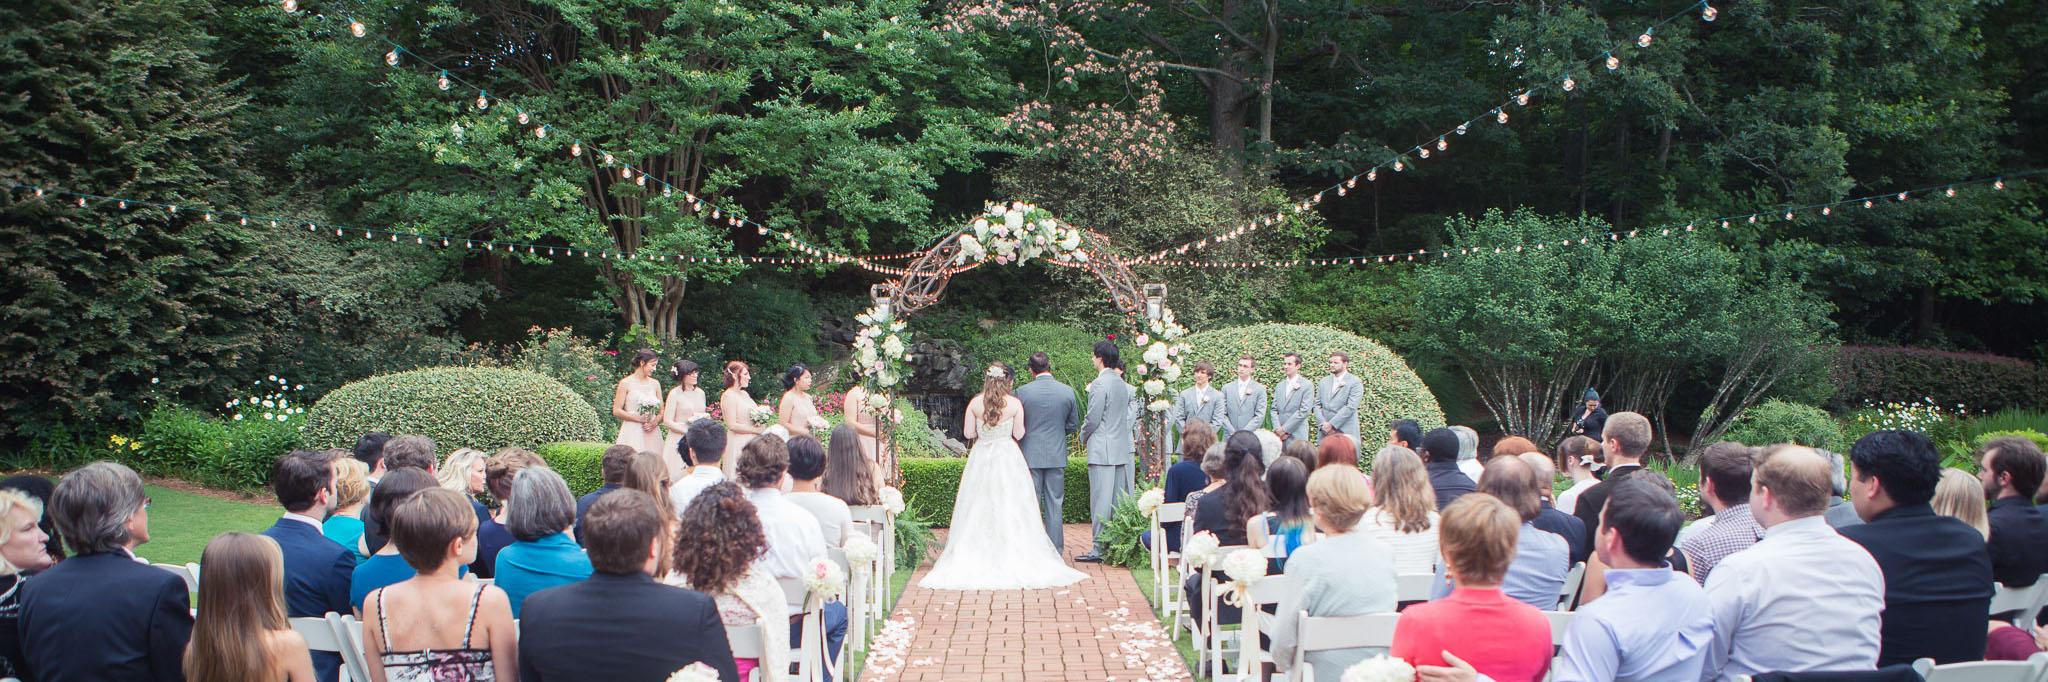 imphotography-wedding-carrieandclint-title